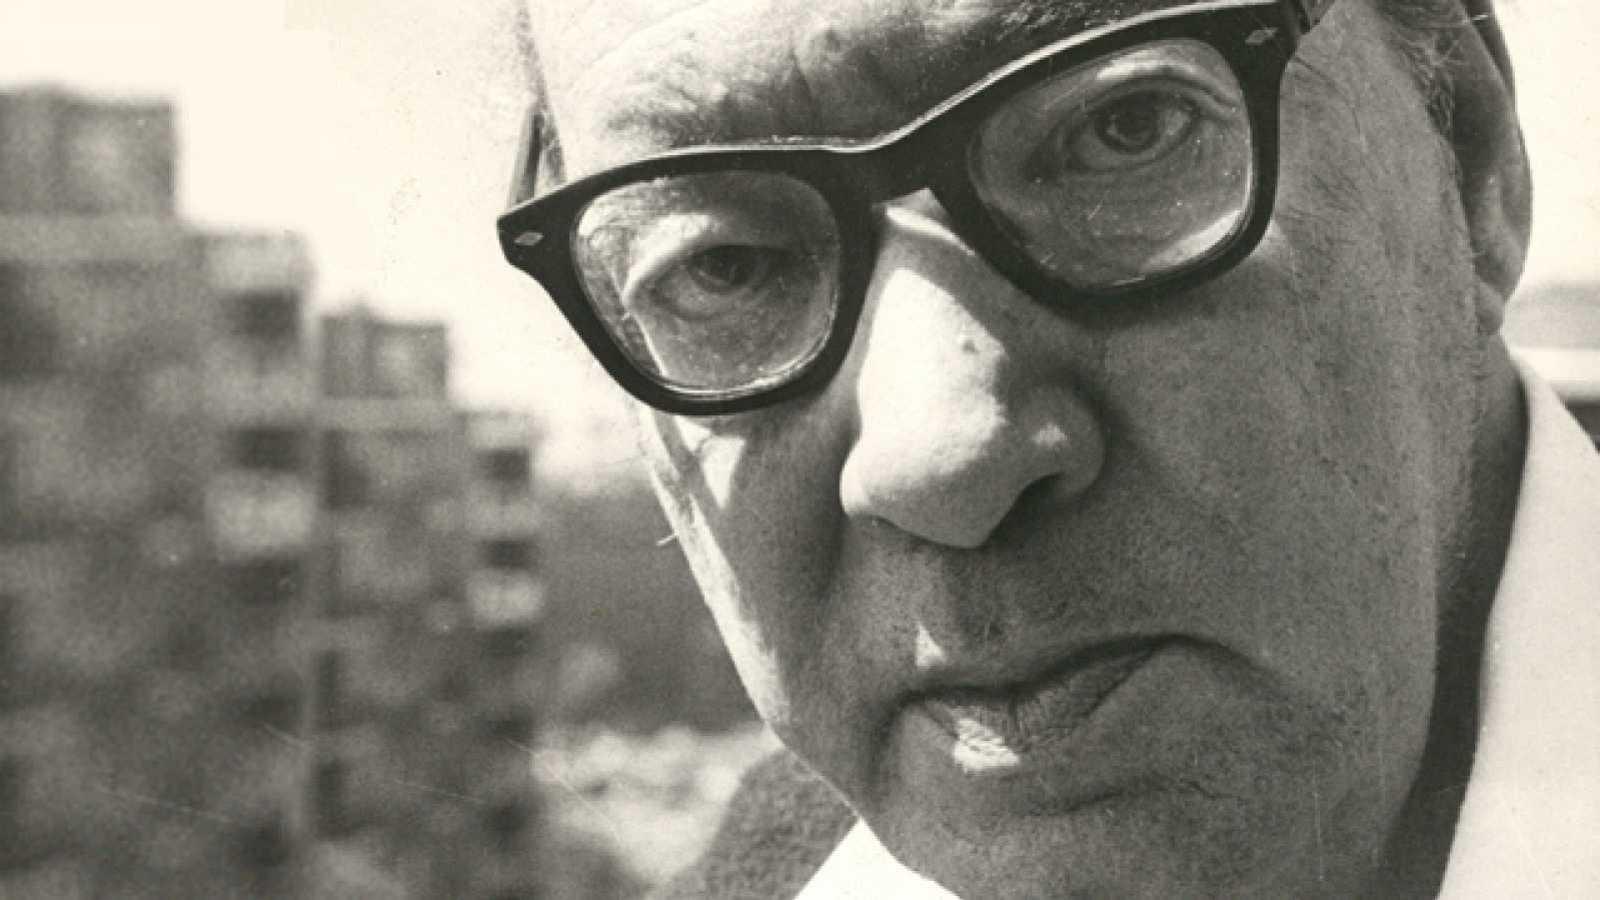 Emisión en árabe - Juan Carlos Onetti, Premio Cervantes 1980 - 23/09/21 - escuchar ahora